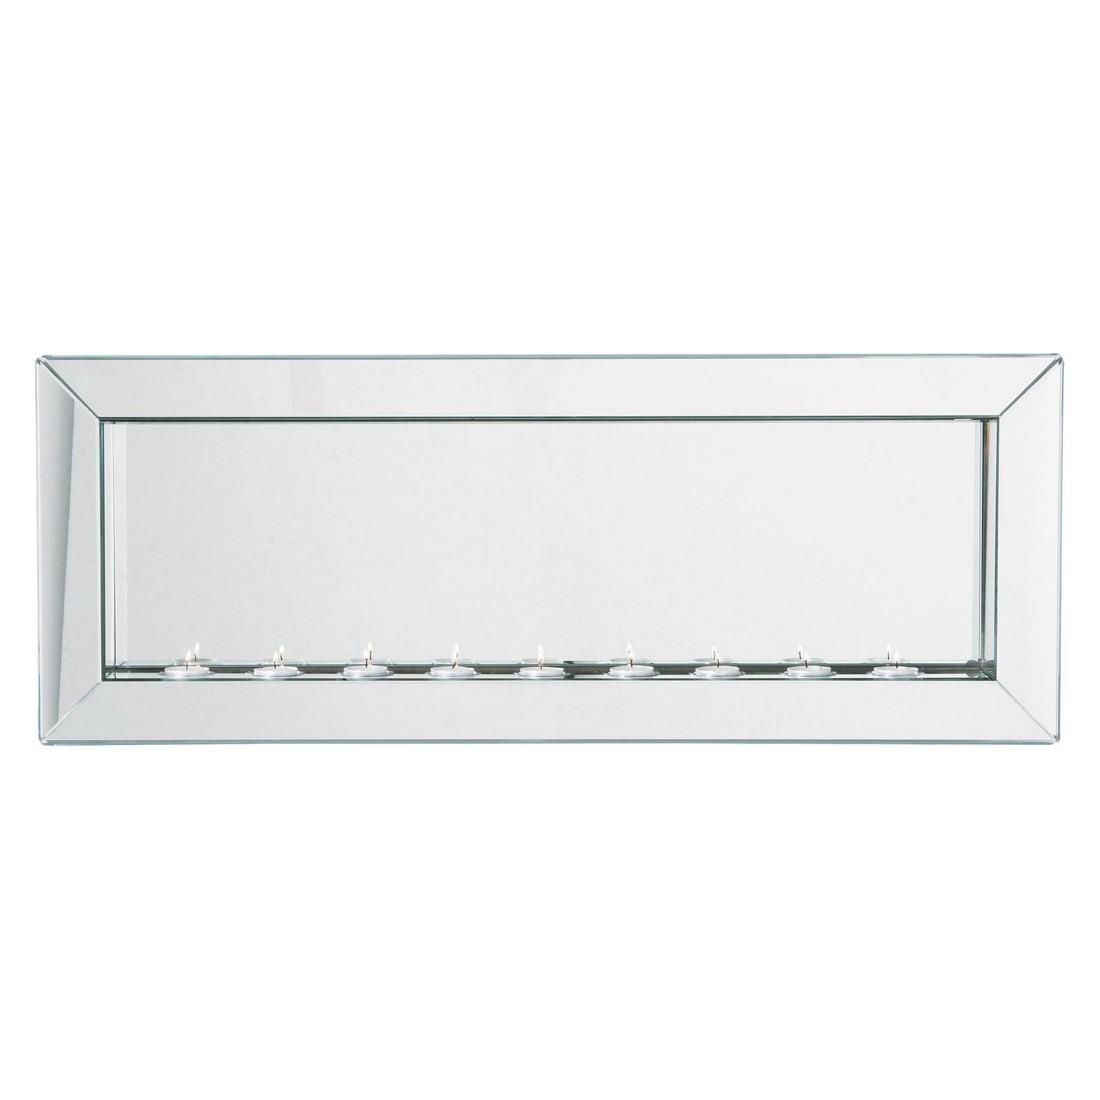 Spiegel Big Beauty Candle Light 90 x 35 cm – Spiegelglas – MDF Grau, Kare Design günstig